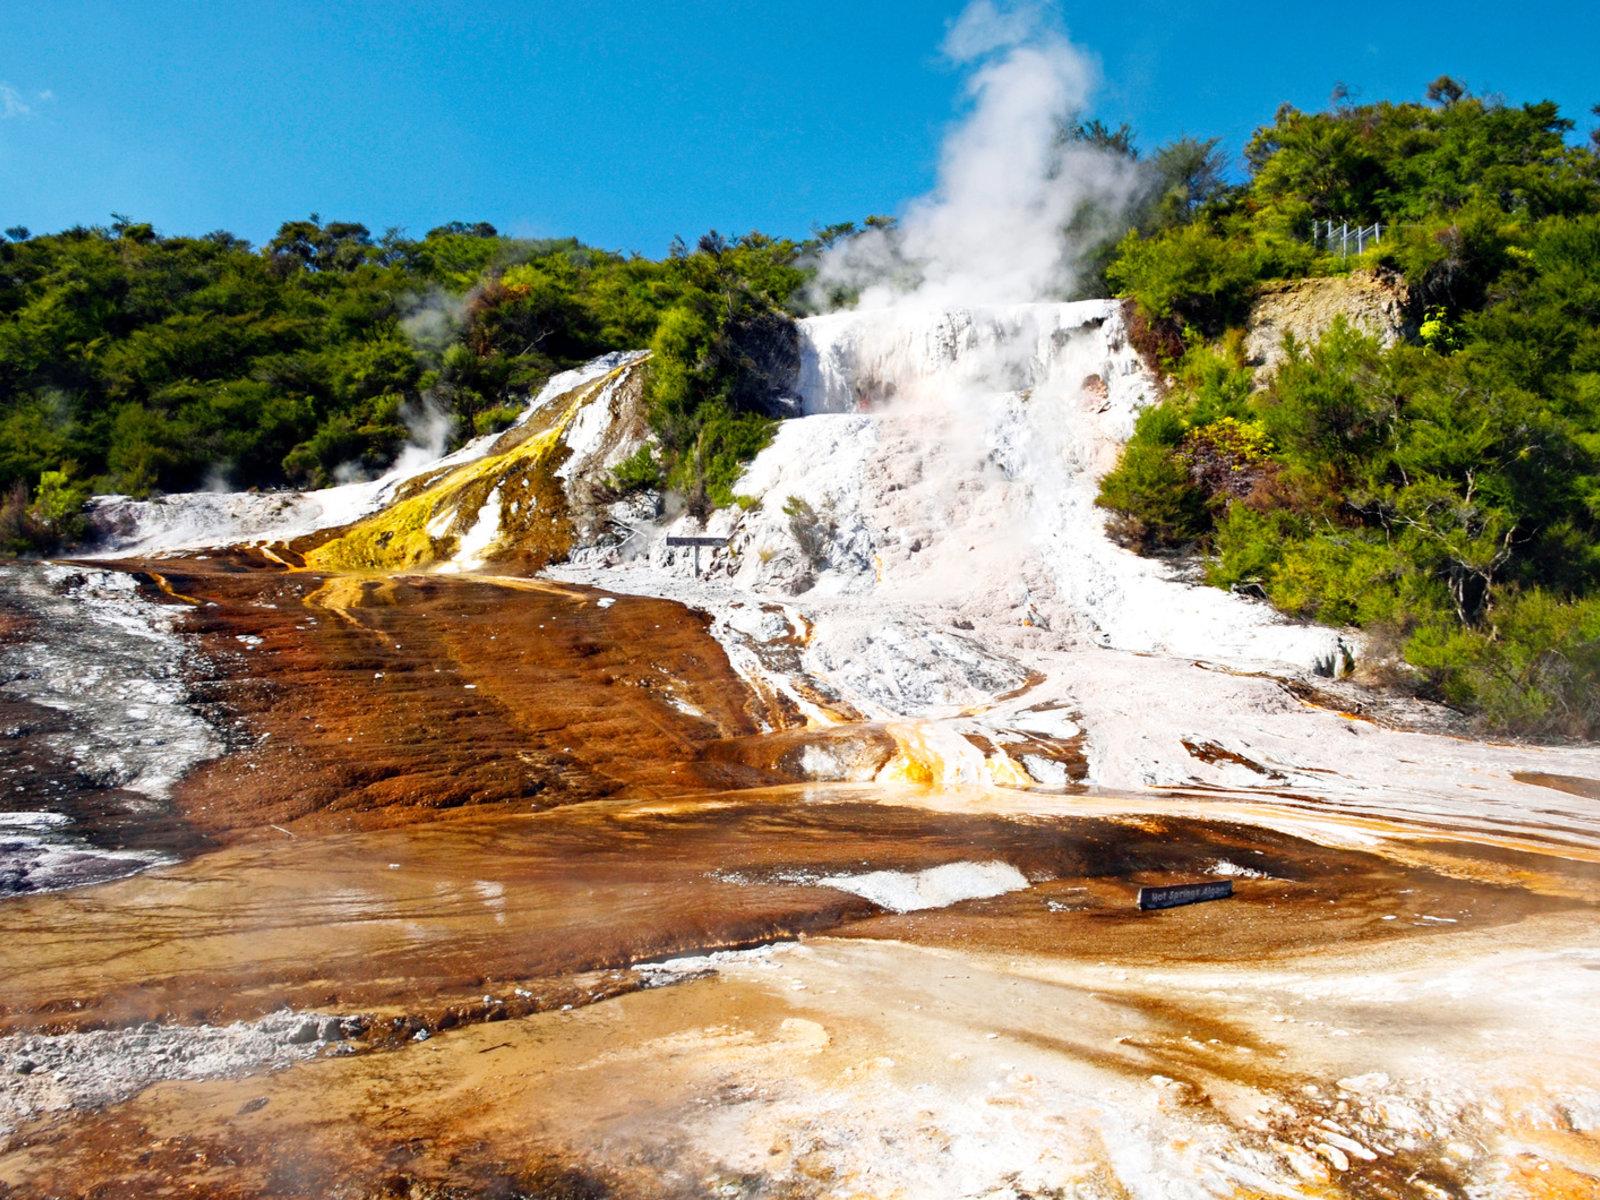 Quelle: Orakei Korako Geothermal Park & Cave